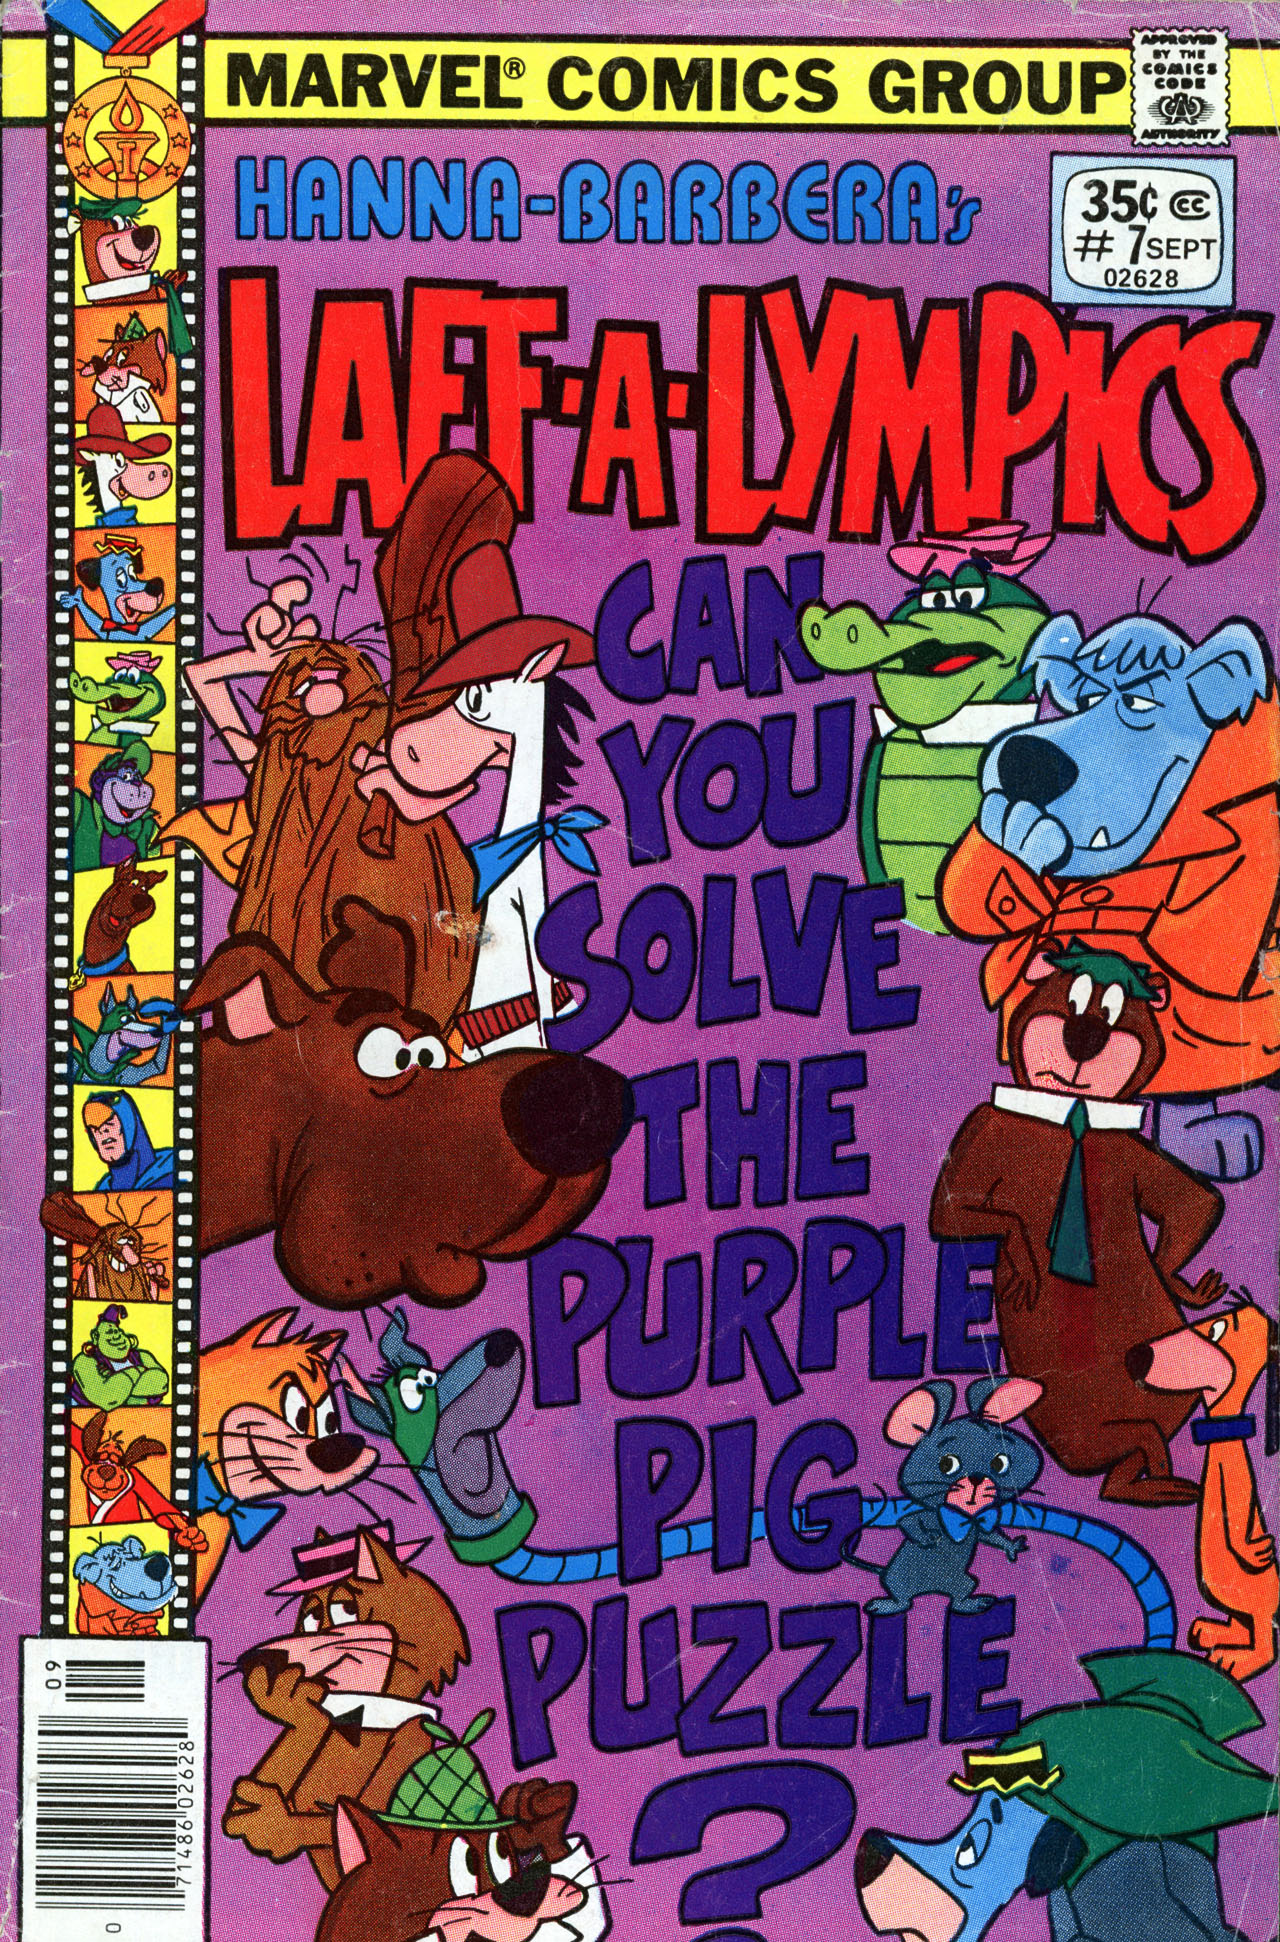 Laff-a-lympics 7 Page 1